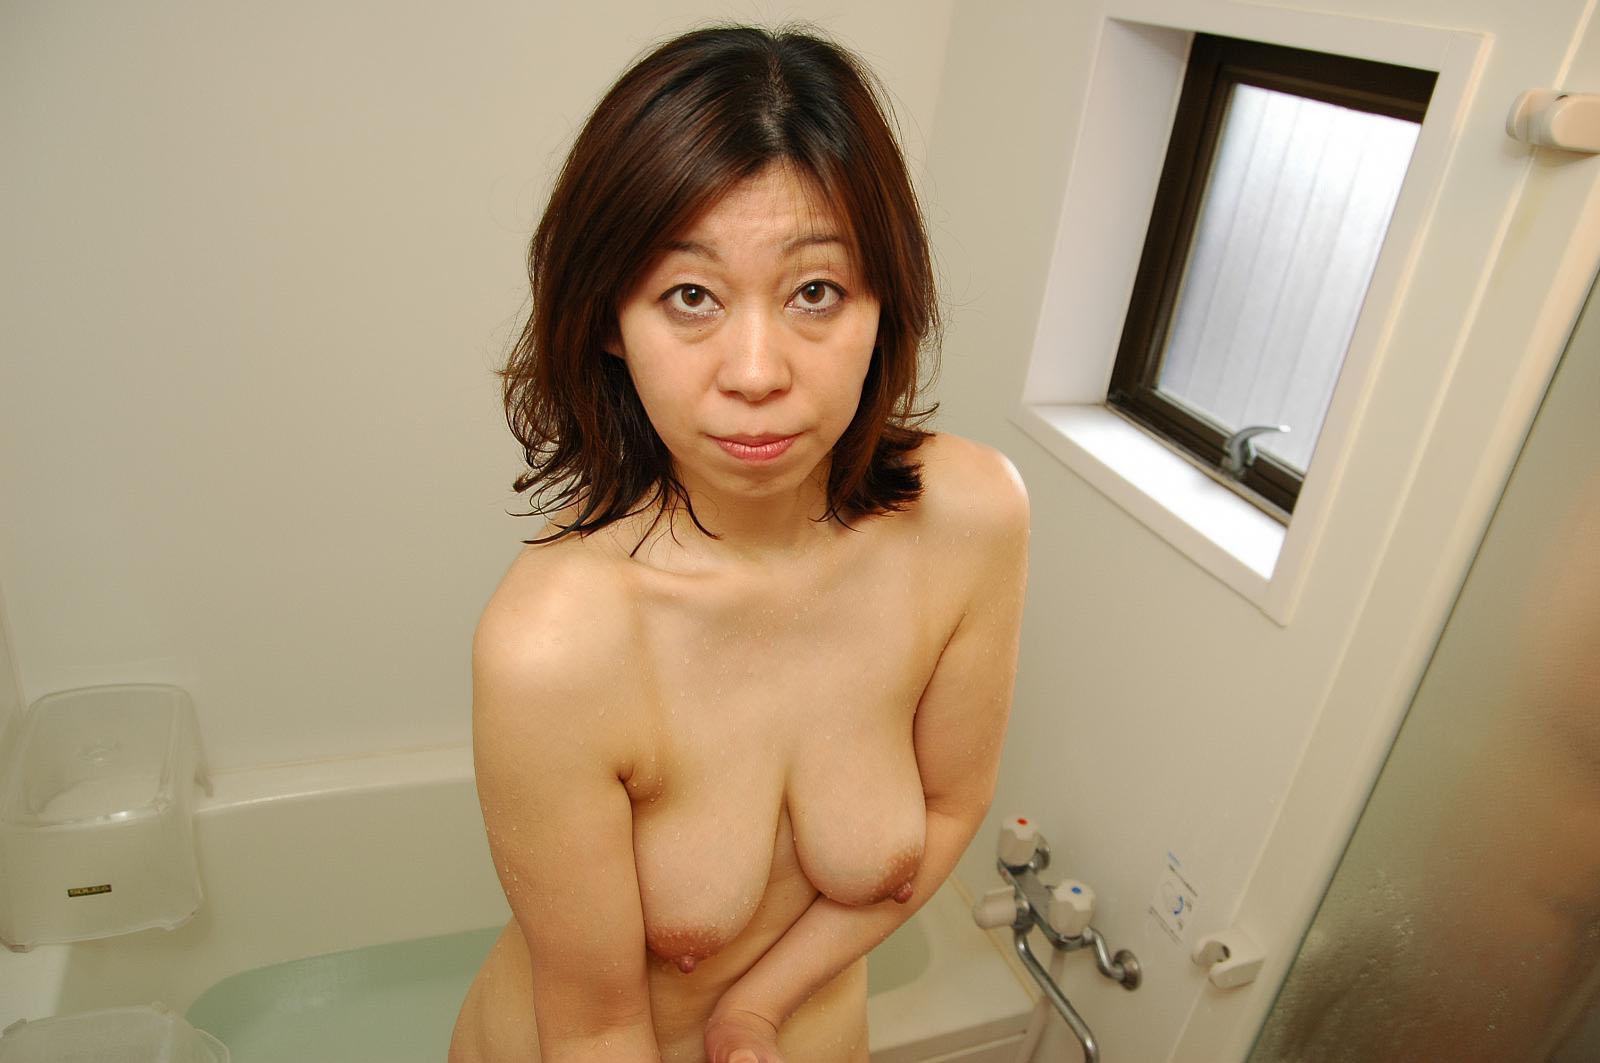 Cumshots on sexy leotard granny picture porn